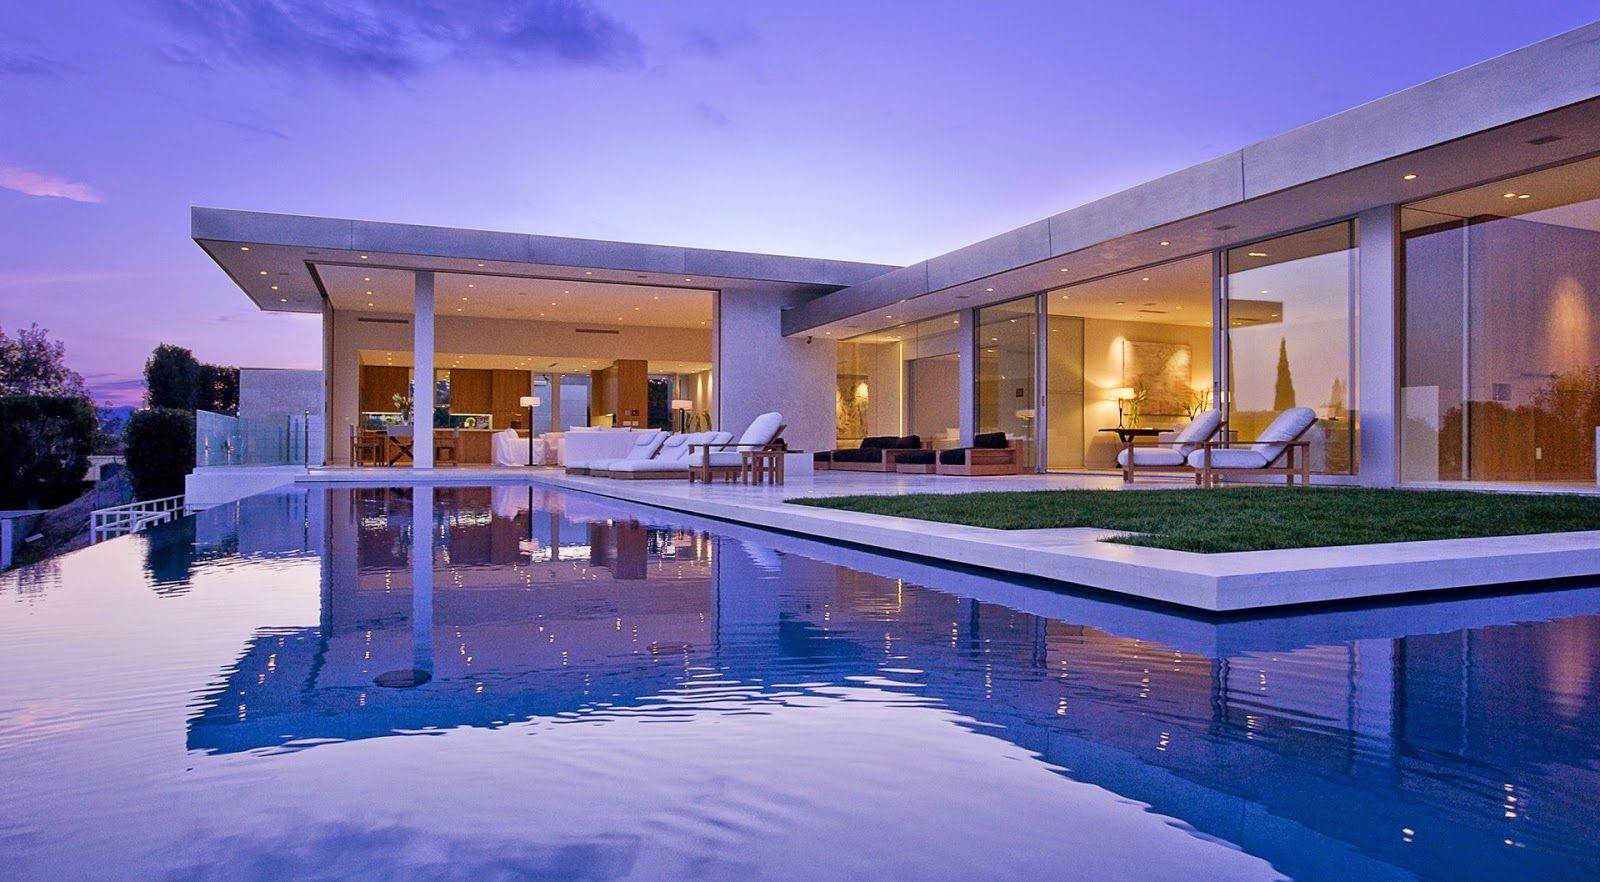 Boa noite o destaque de hoje vai para o blog arquitetura for Piscina haas e boa